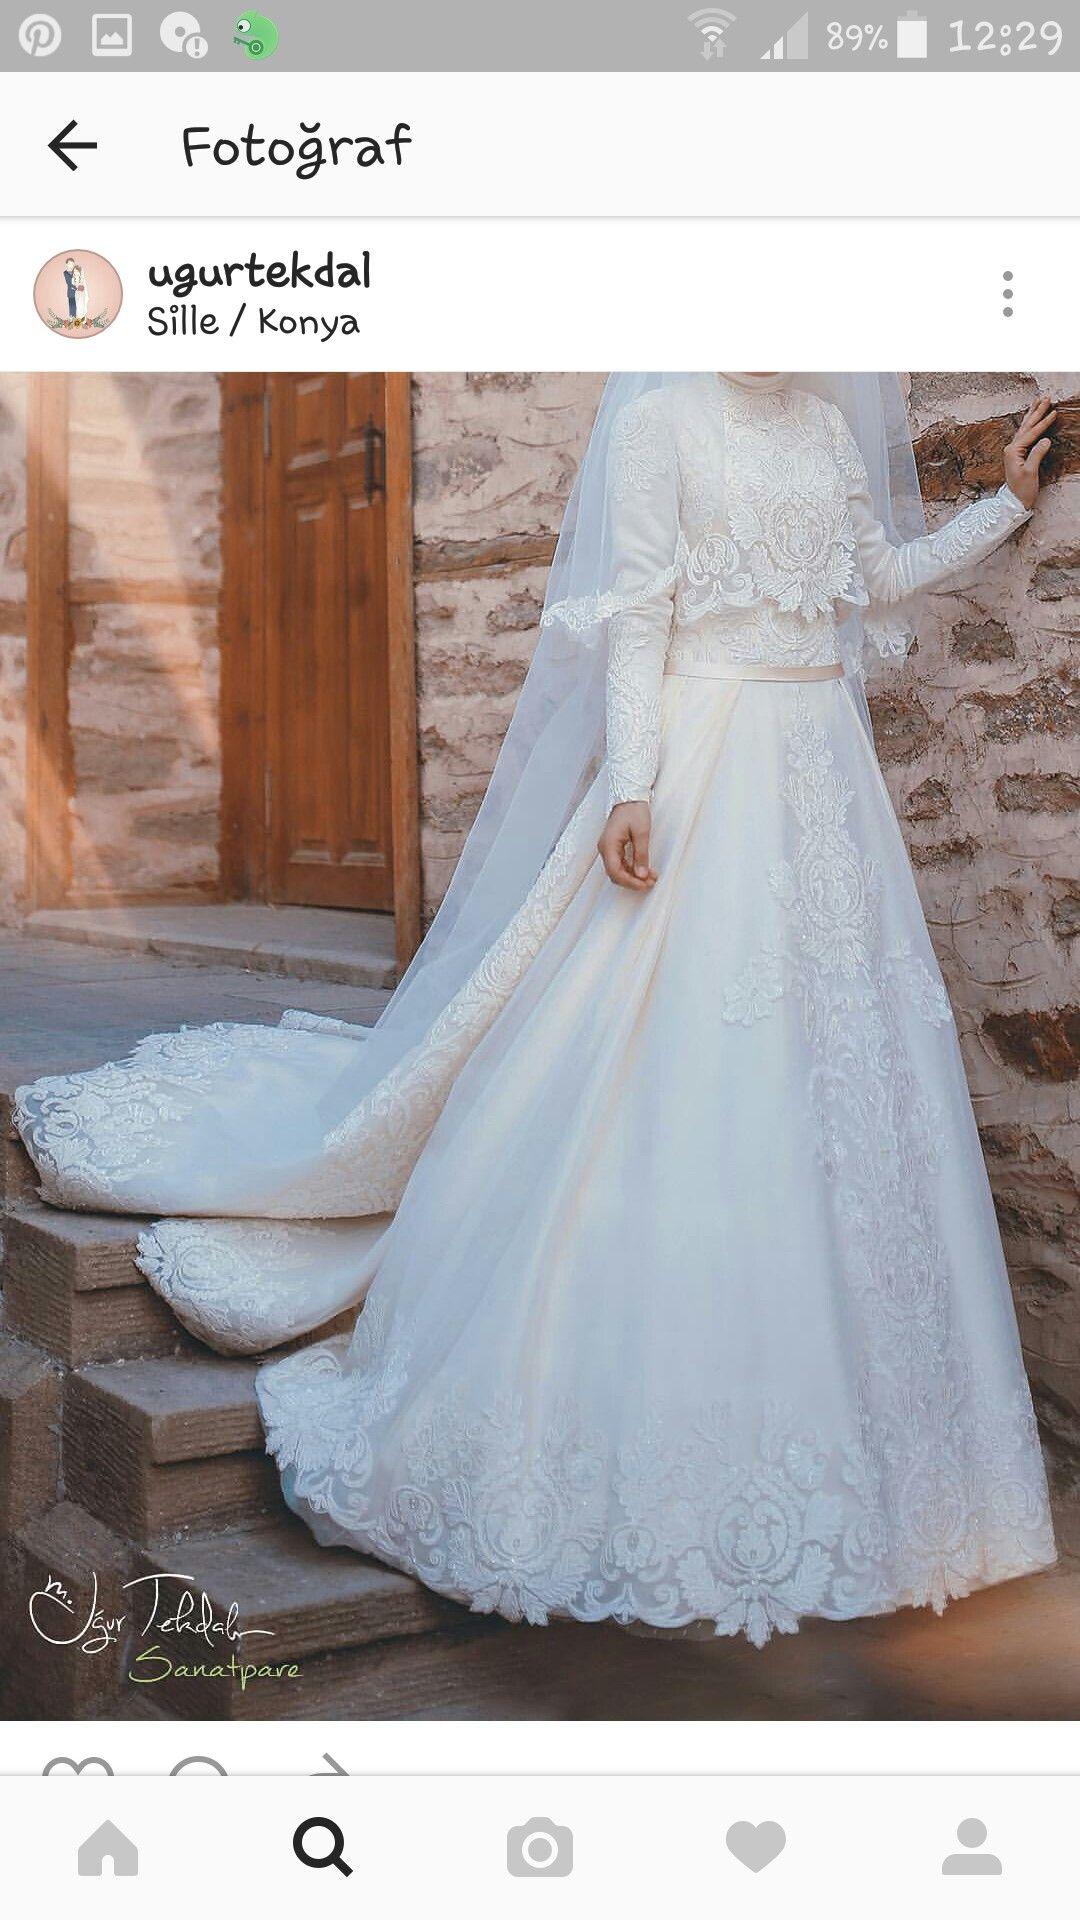 Favorim hijab styles pinterest photojournalism wedding and brides